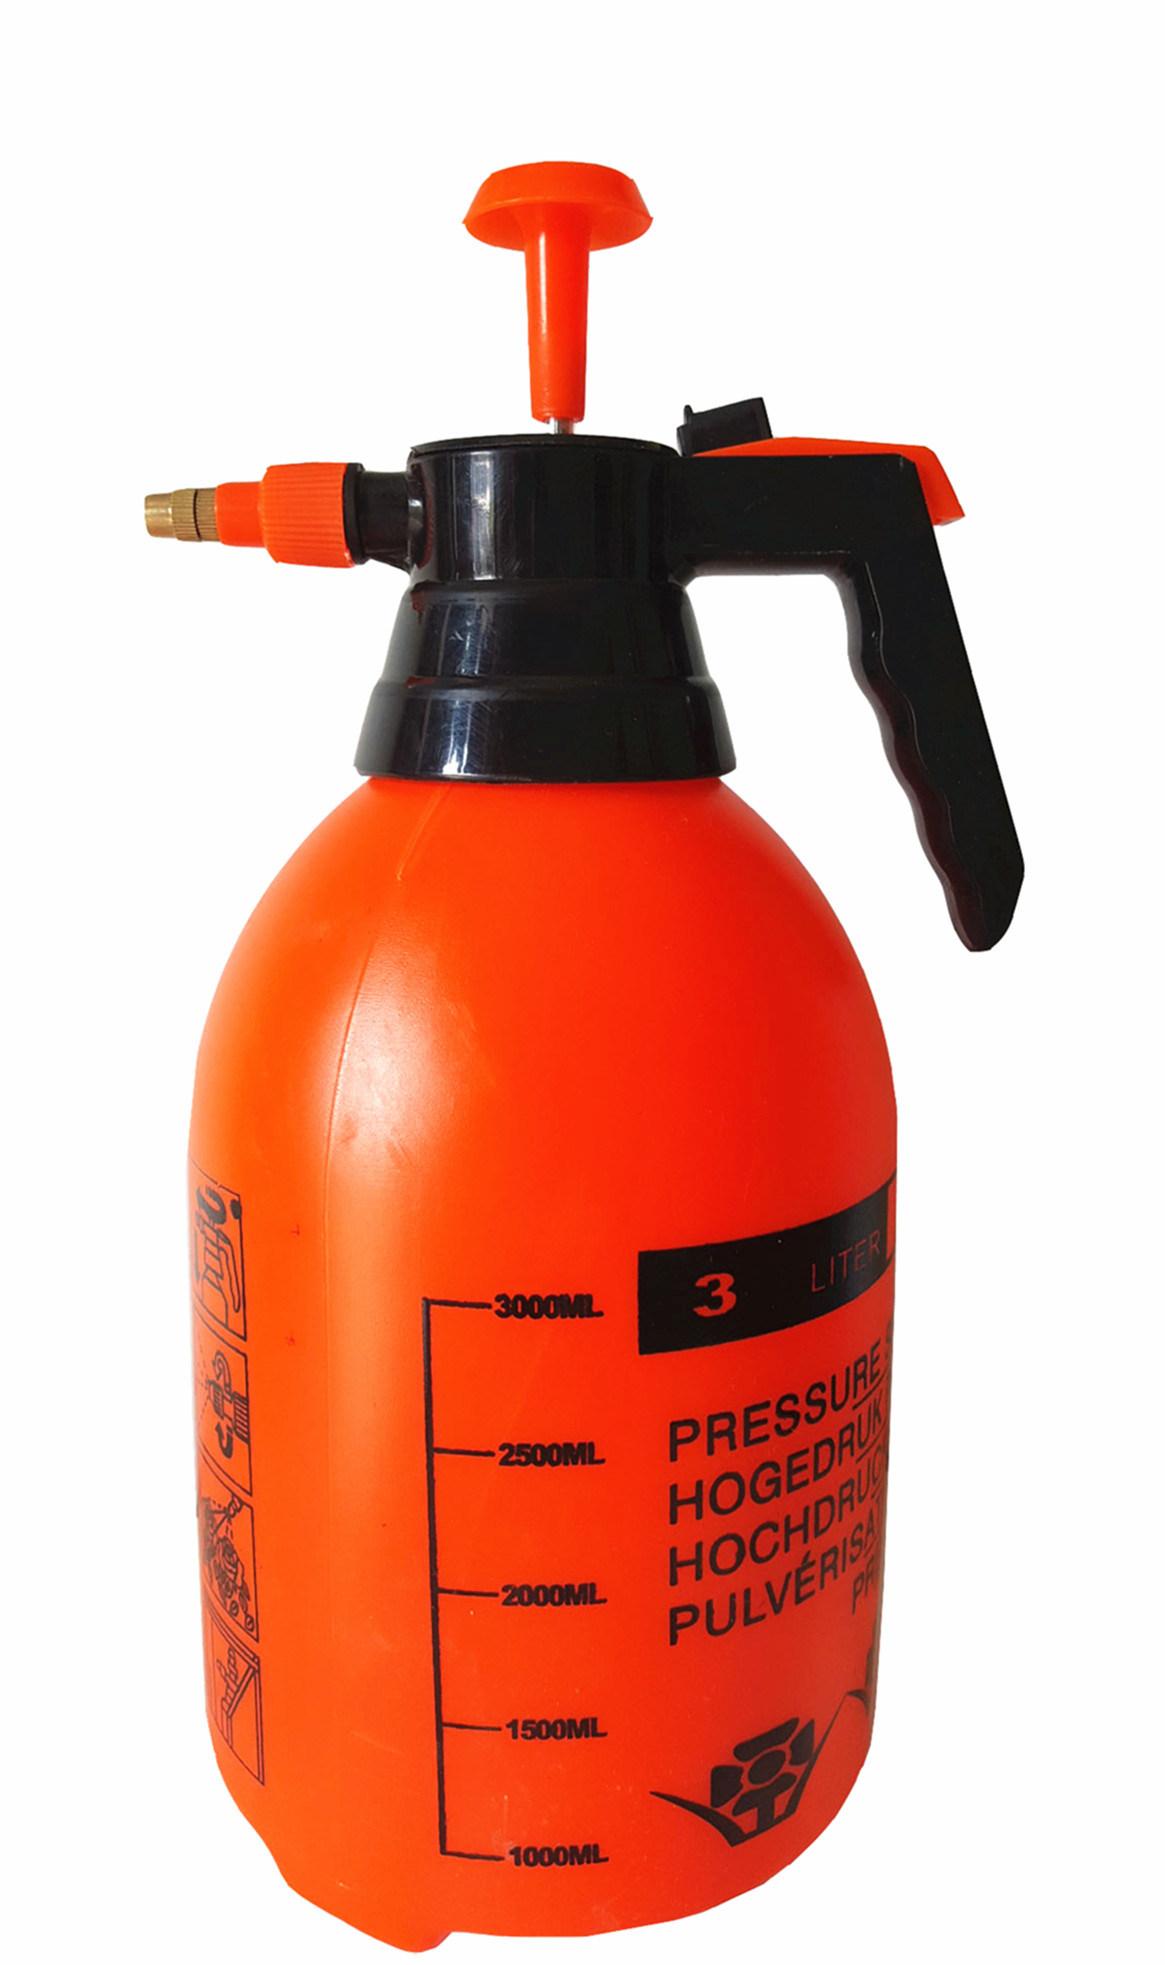 3litre Garden Pressure Sprayers (HT-3L)